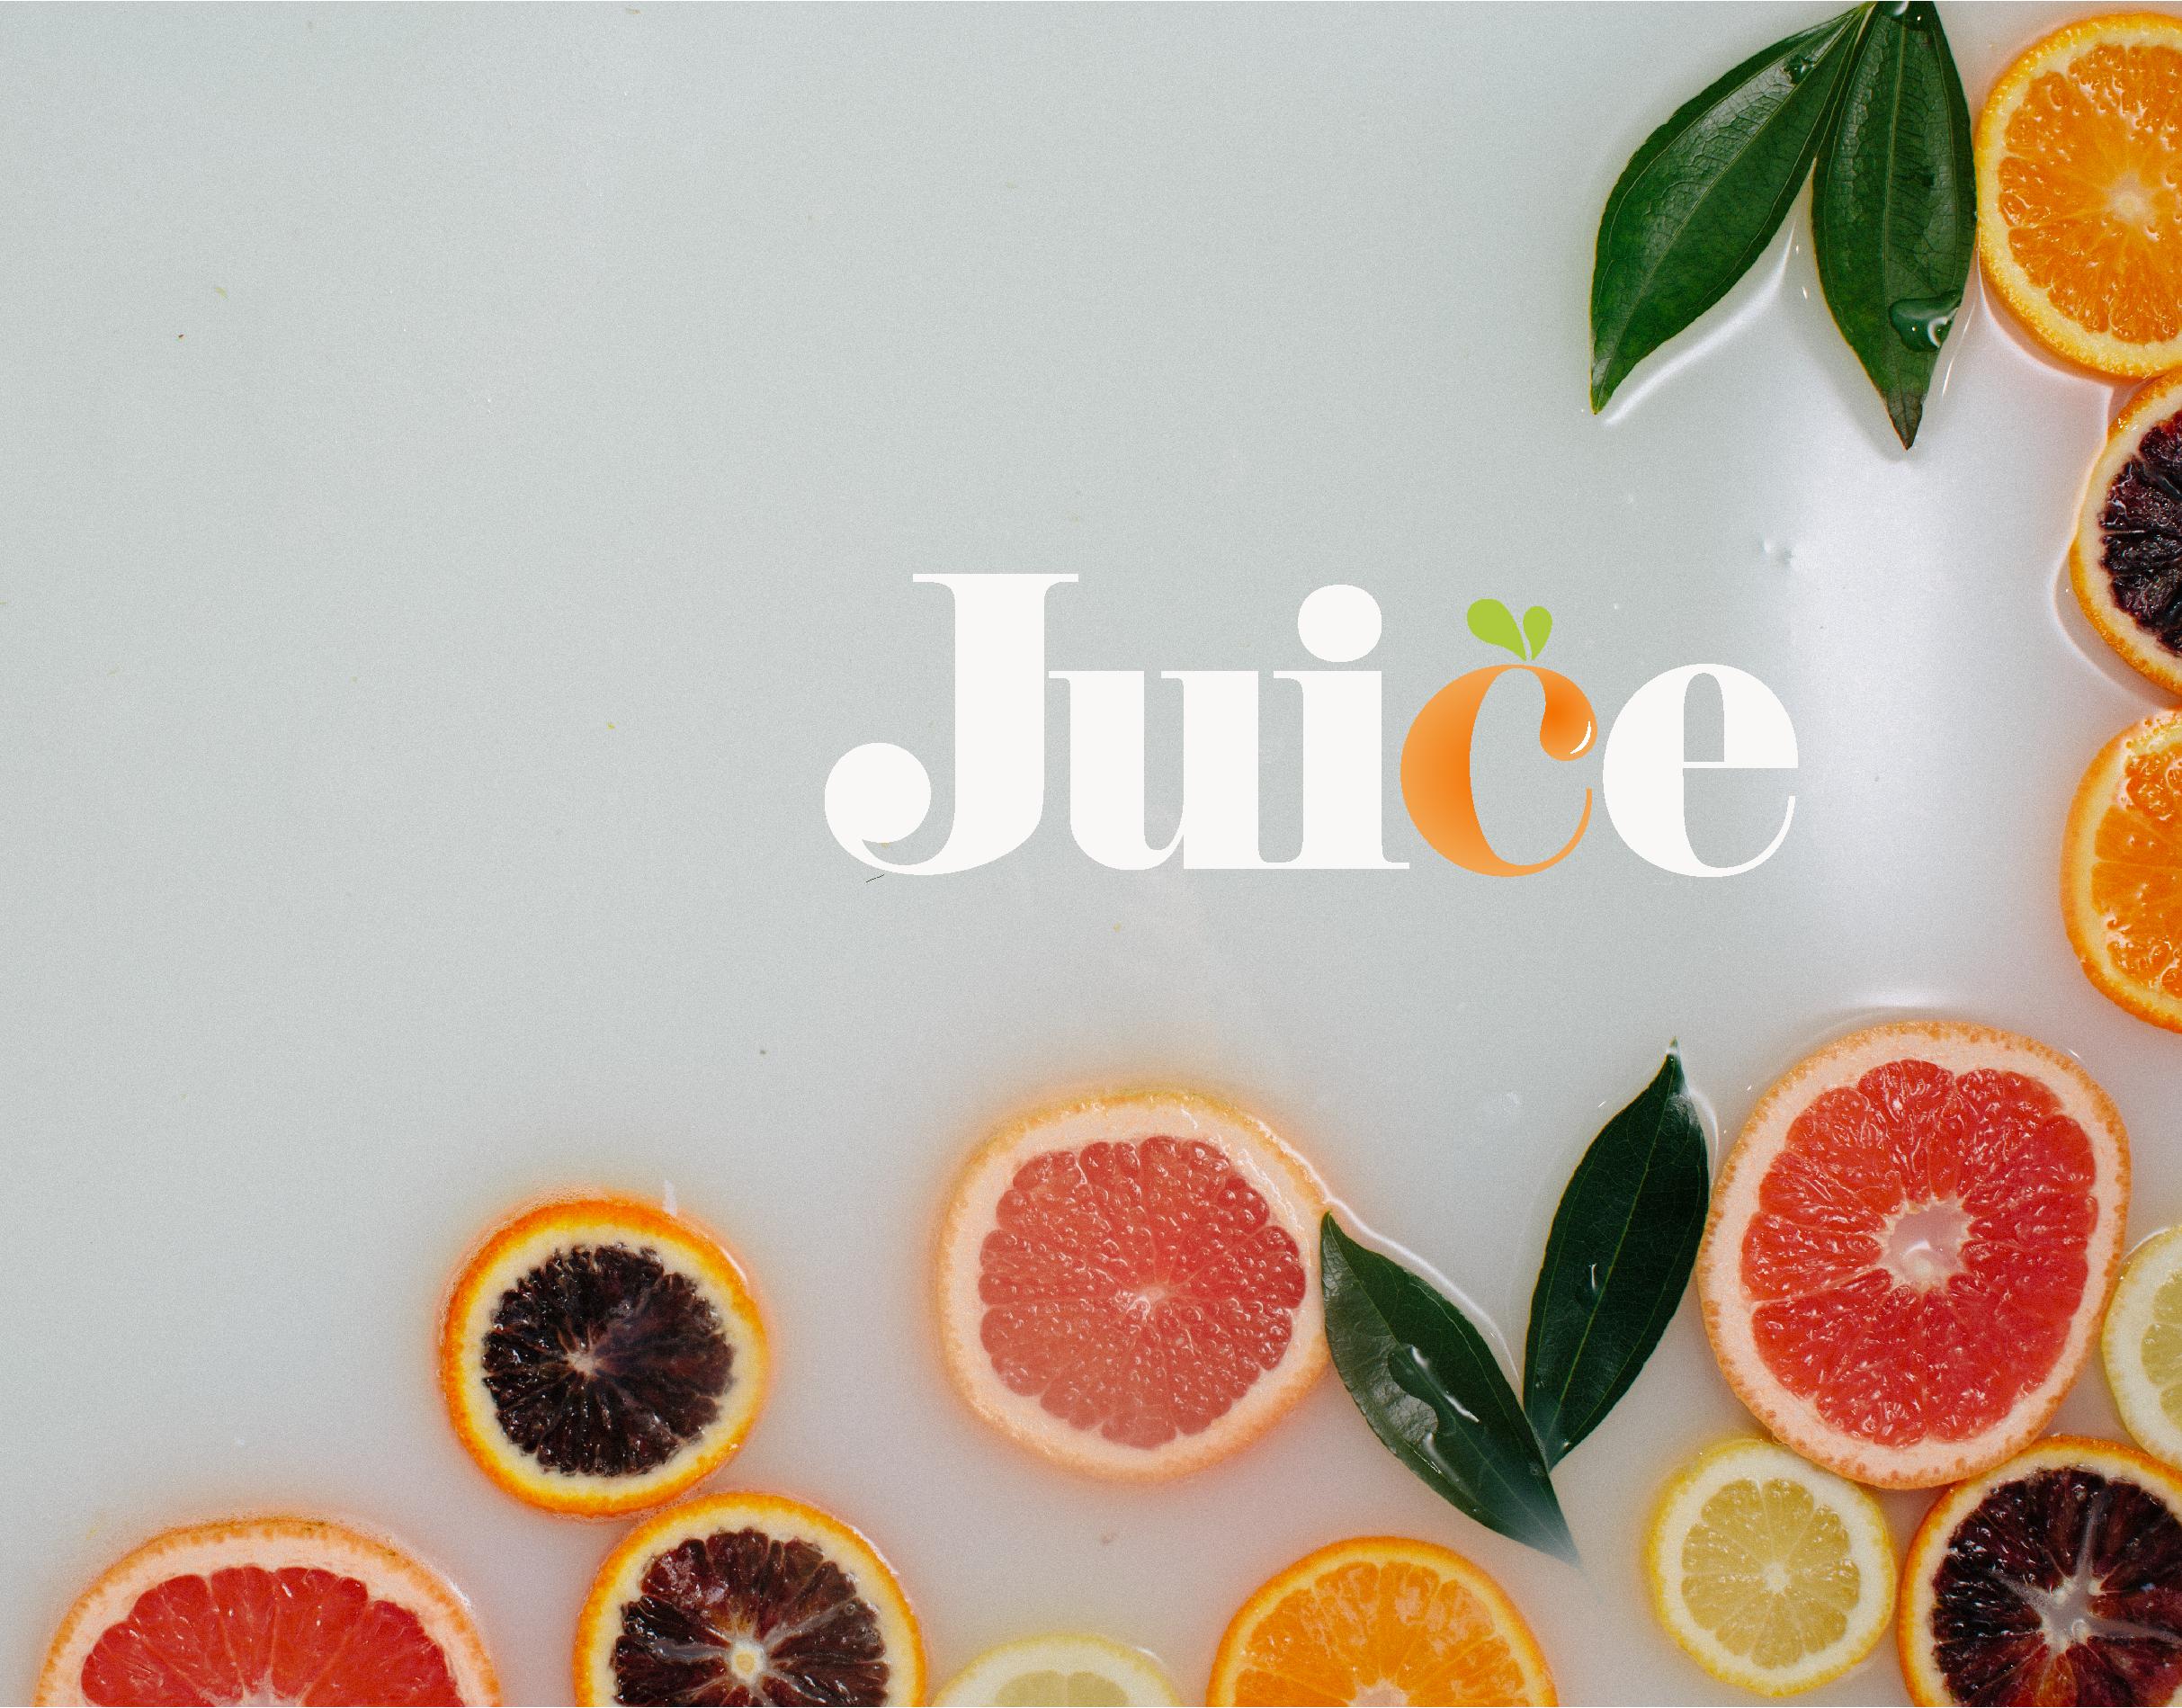 Juice2-01.png